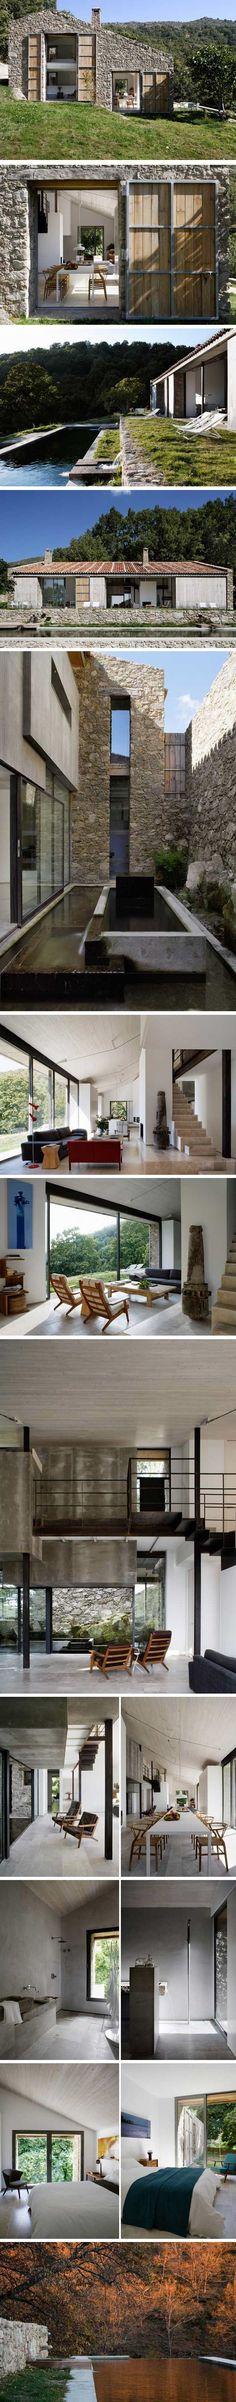 Sumptuous villa in Spain ABATON